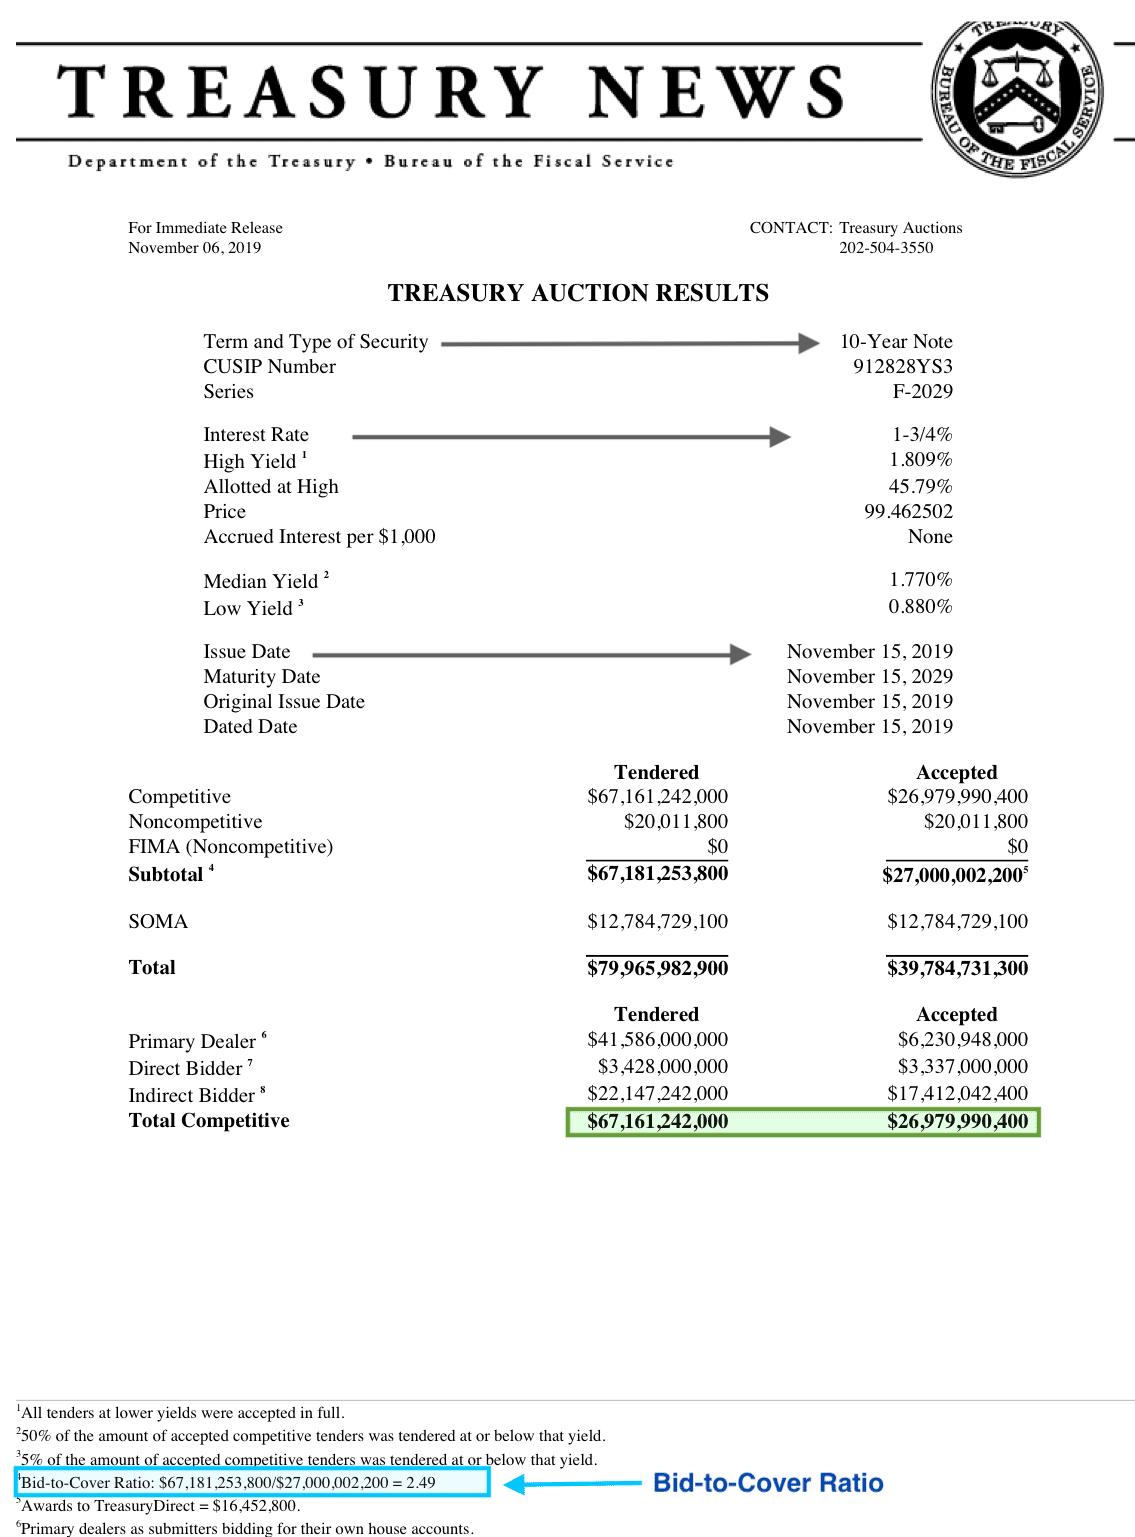 Treasury Auction Bid-to-Cover Example